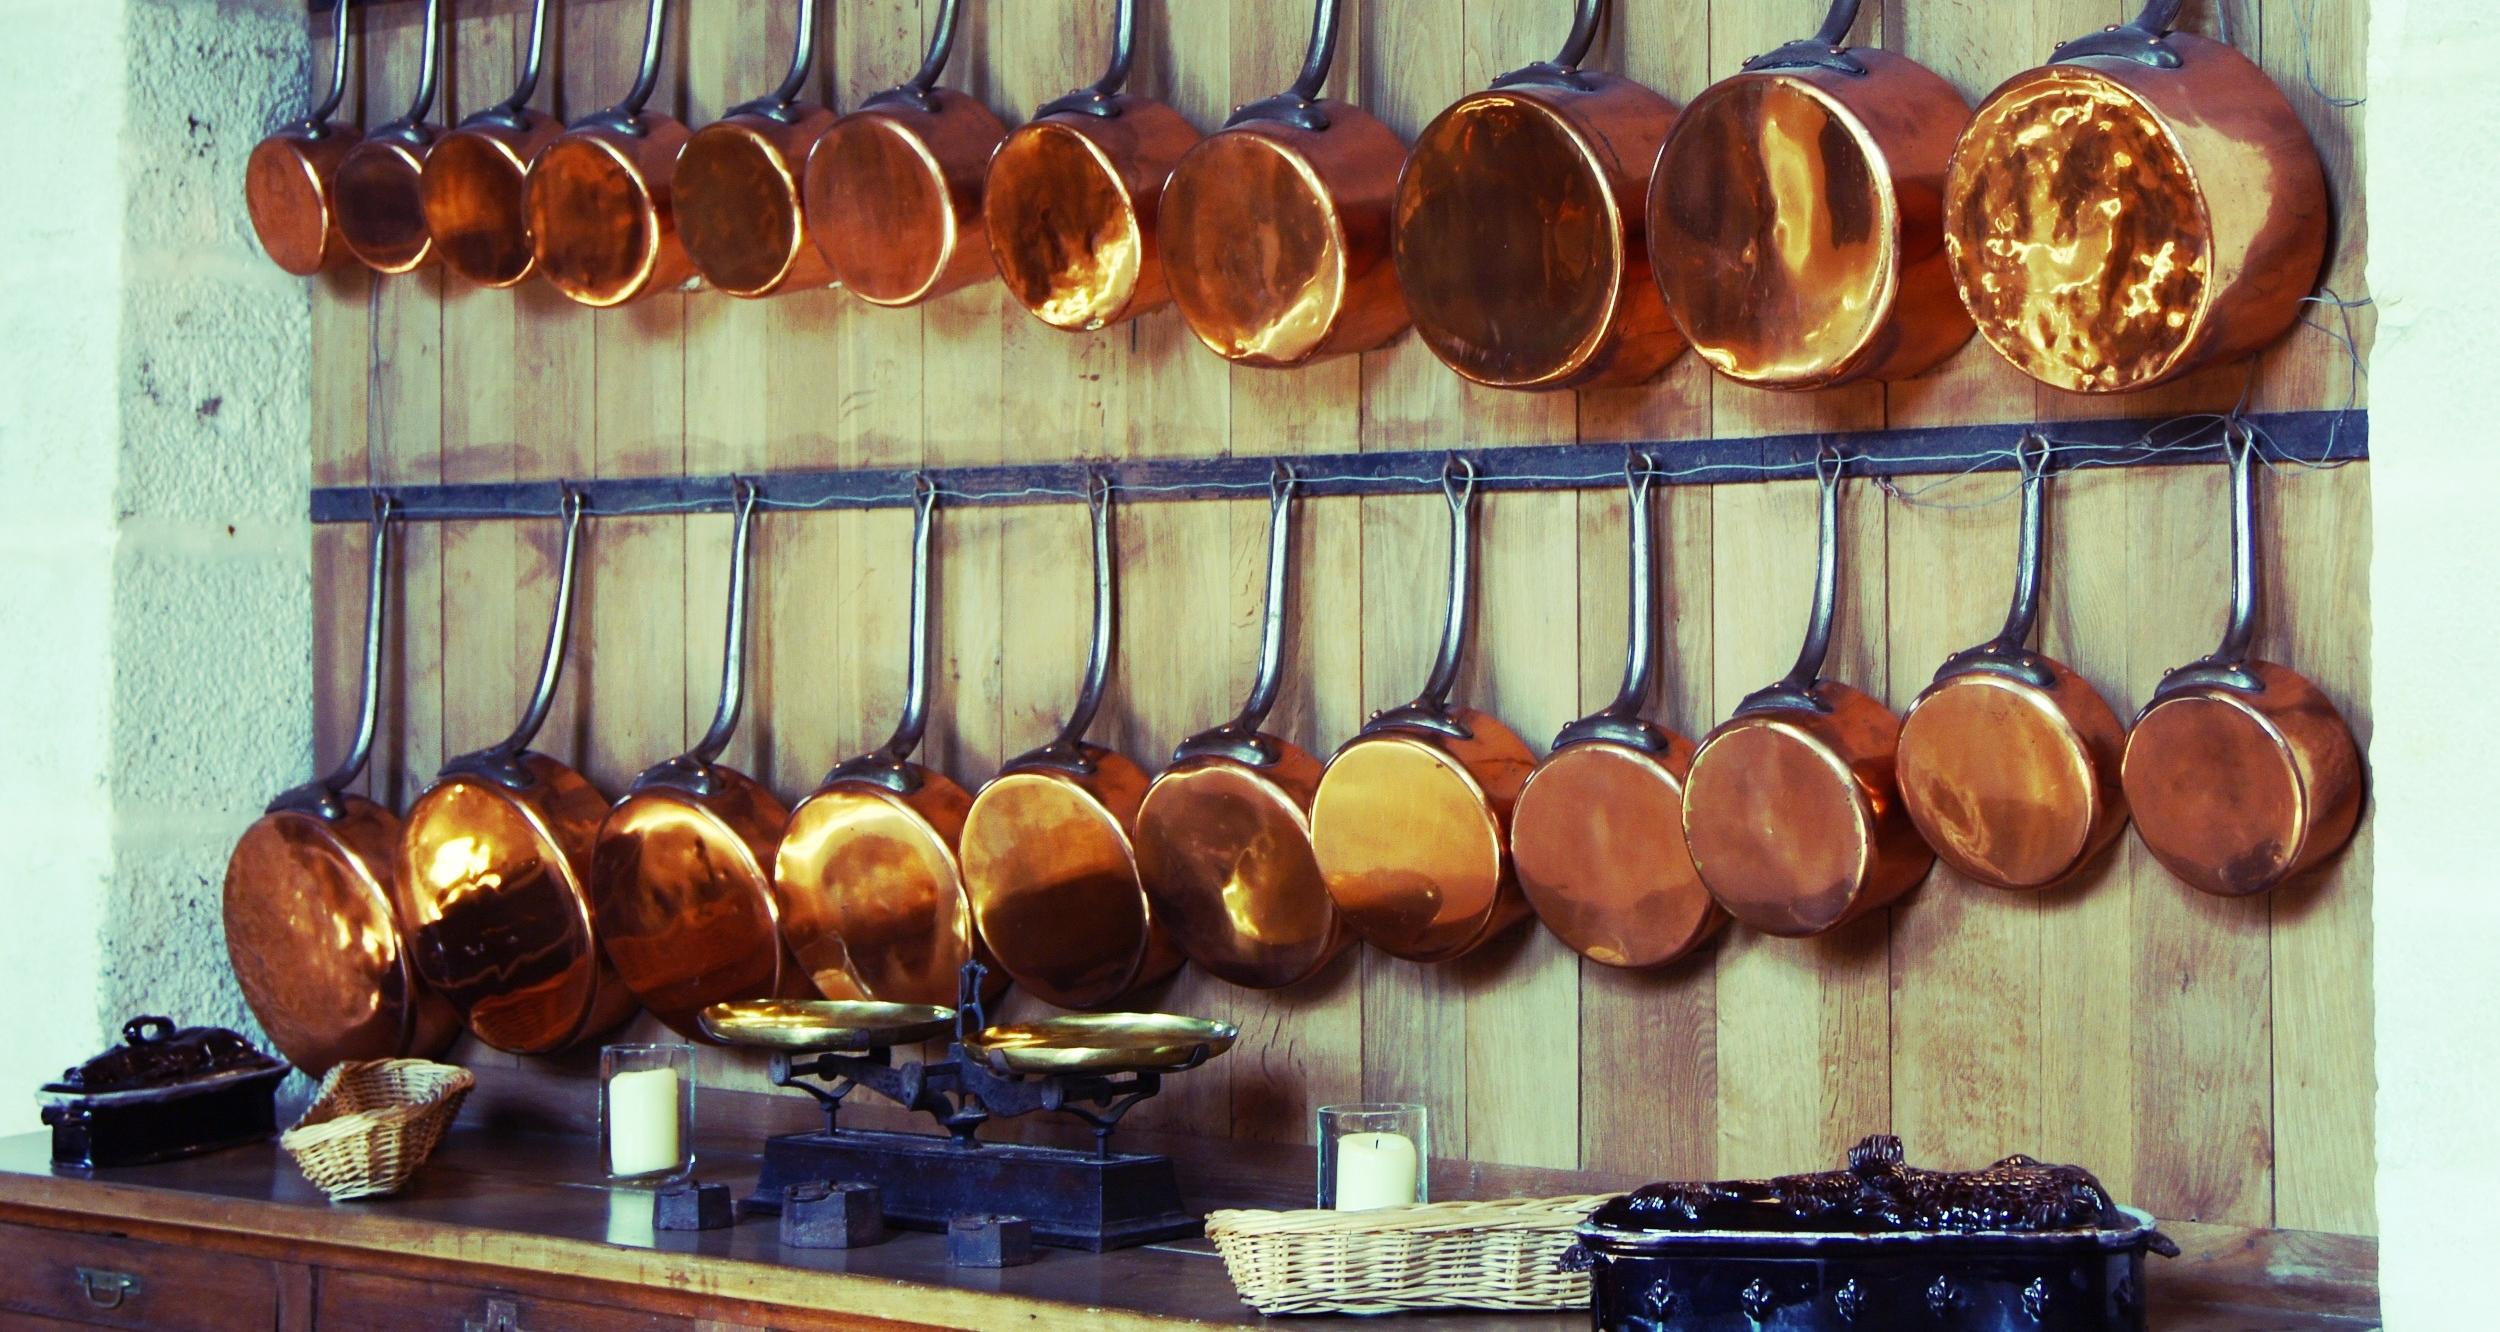 retro-vintage-kitchenware-ceramics.jpg